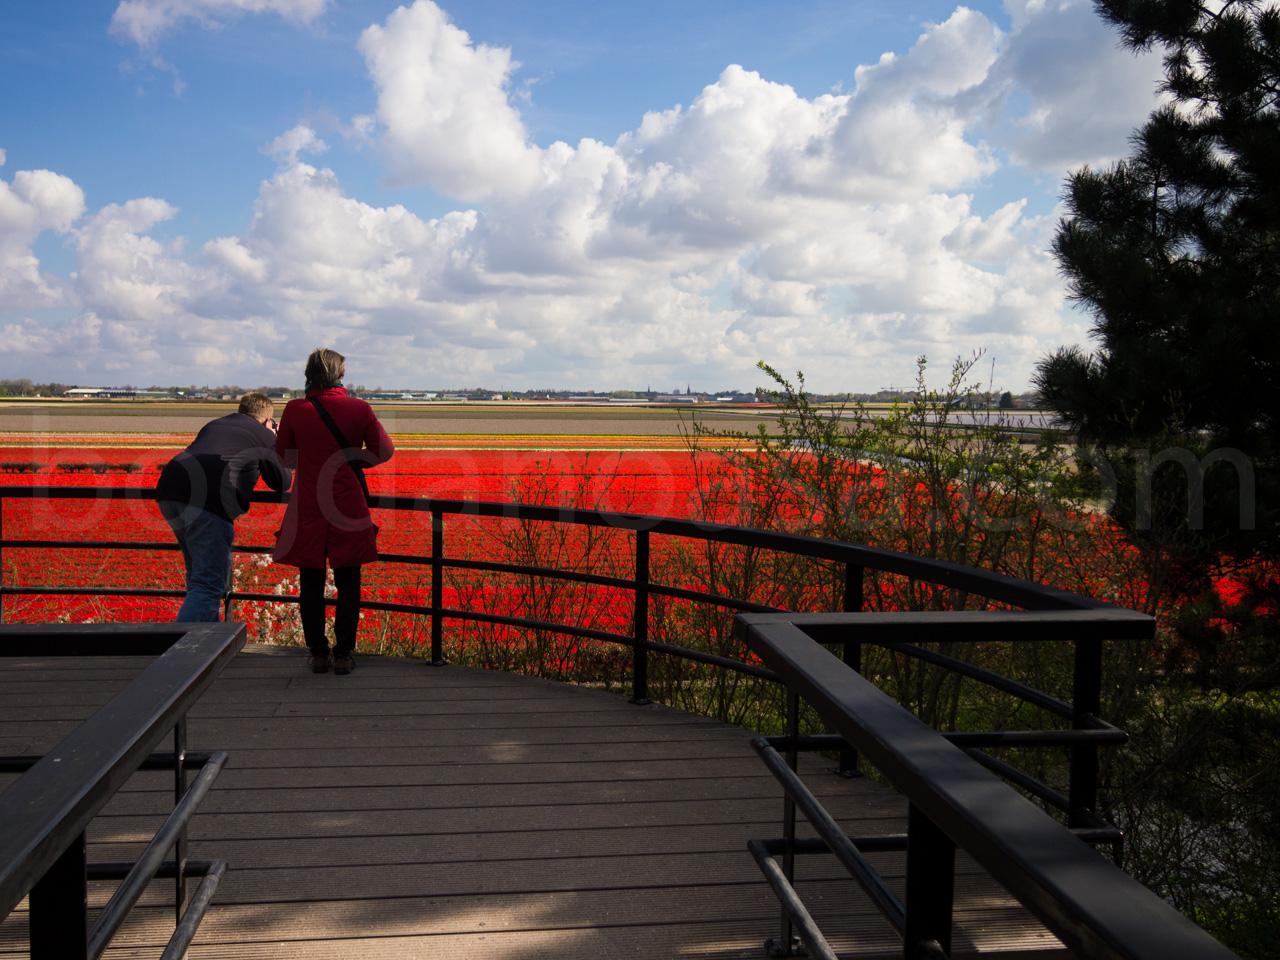 Netherland Tulip Fields from Keukenhow Viewspot